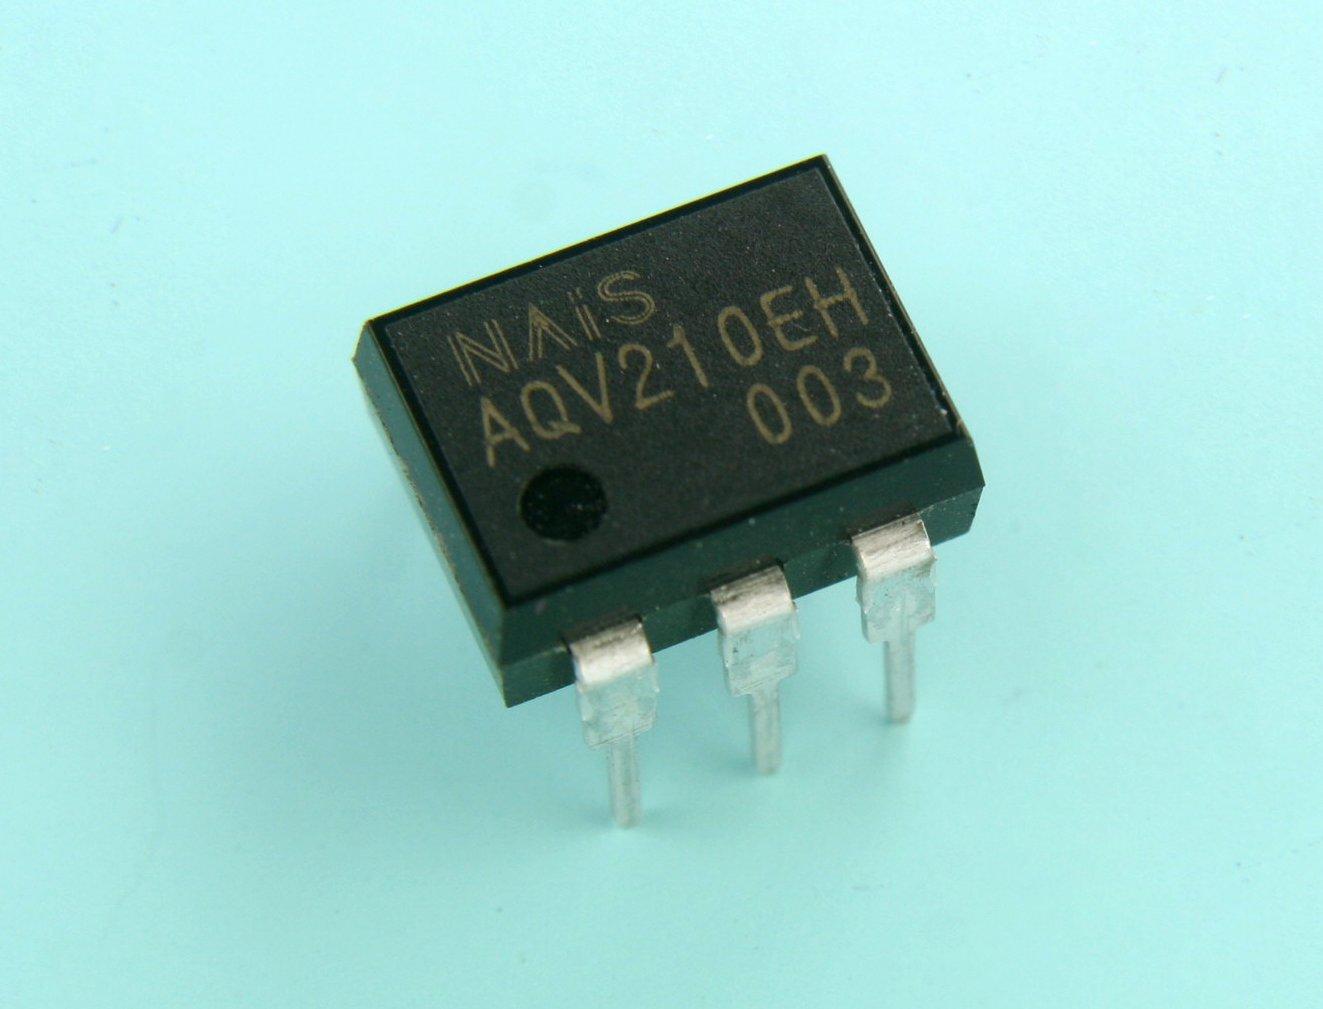 Galleon - Panasonic NAIS Mosfet Solid State Relay 130MA 350V 6PIN ...